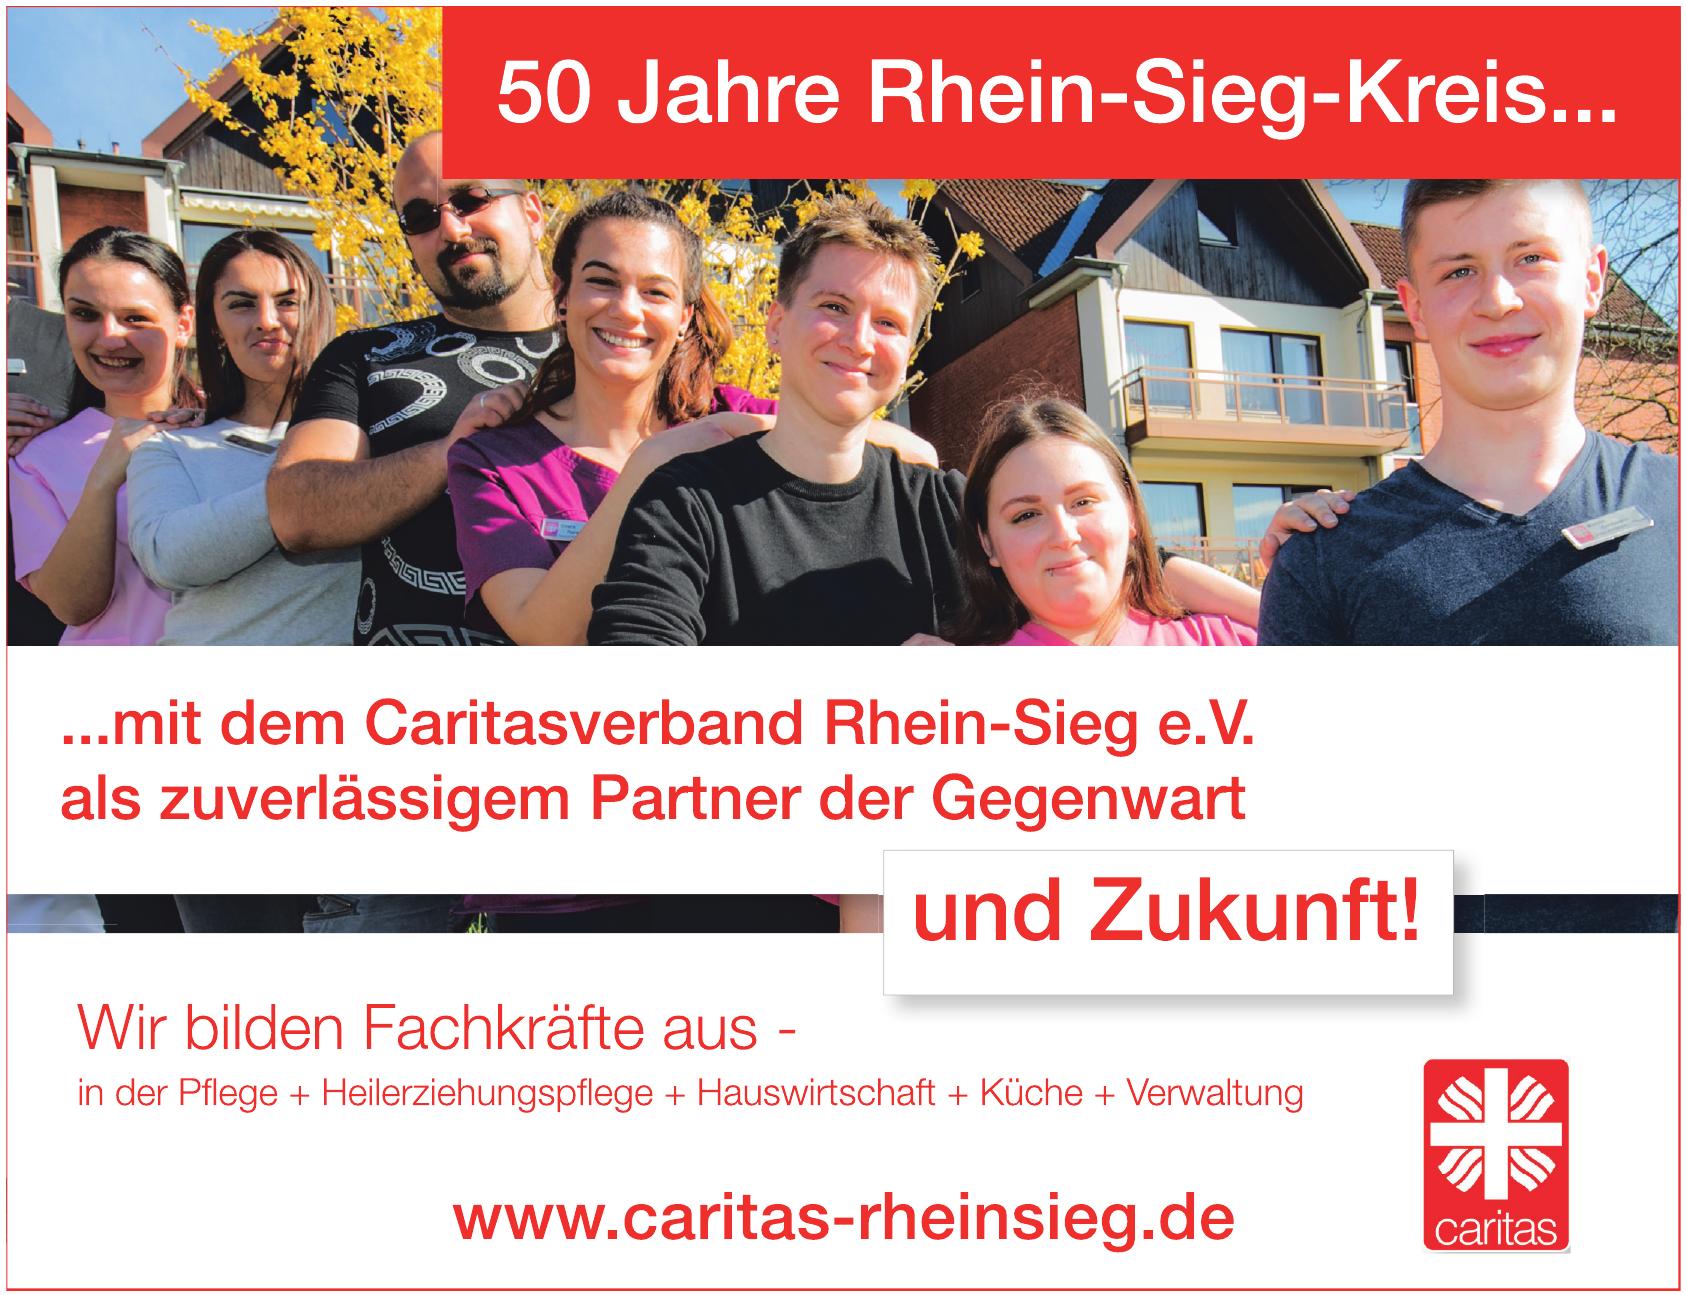 Caritasverband Rhein-Sieg e.V.